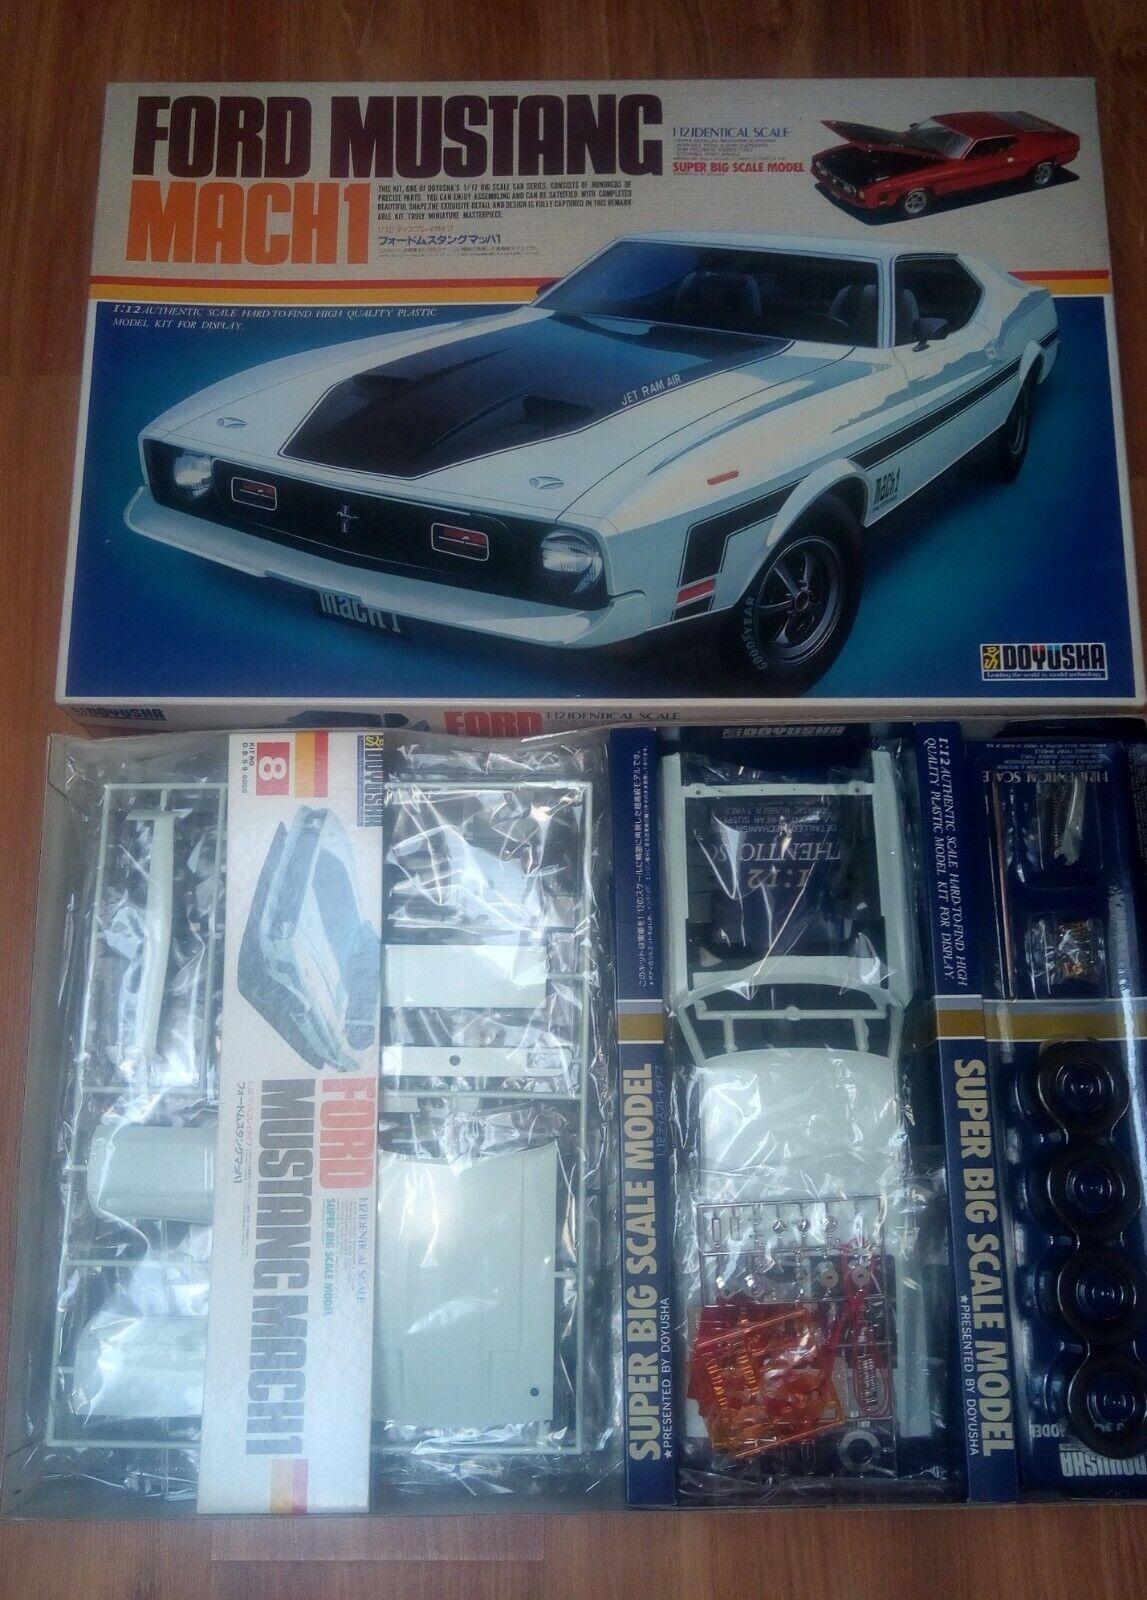 Ford Mustang Mach 1 model kit Doyusha 1 12